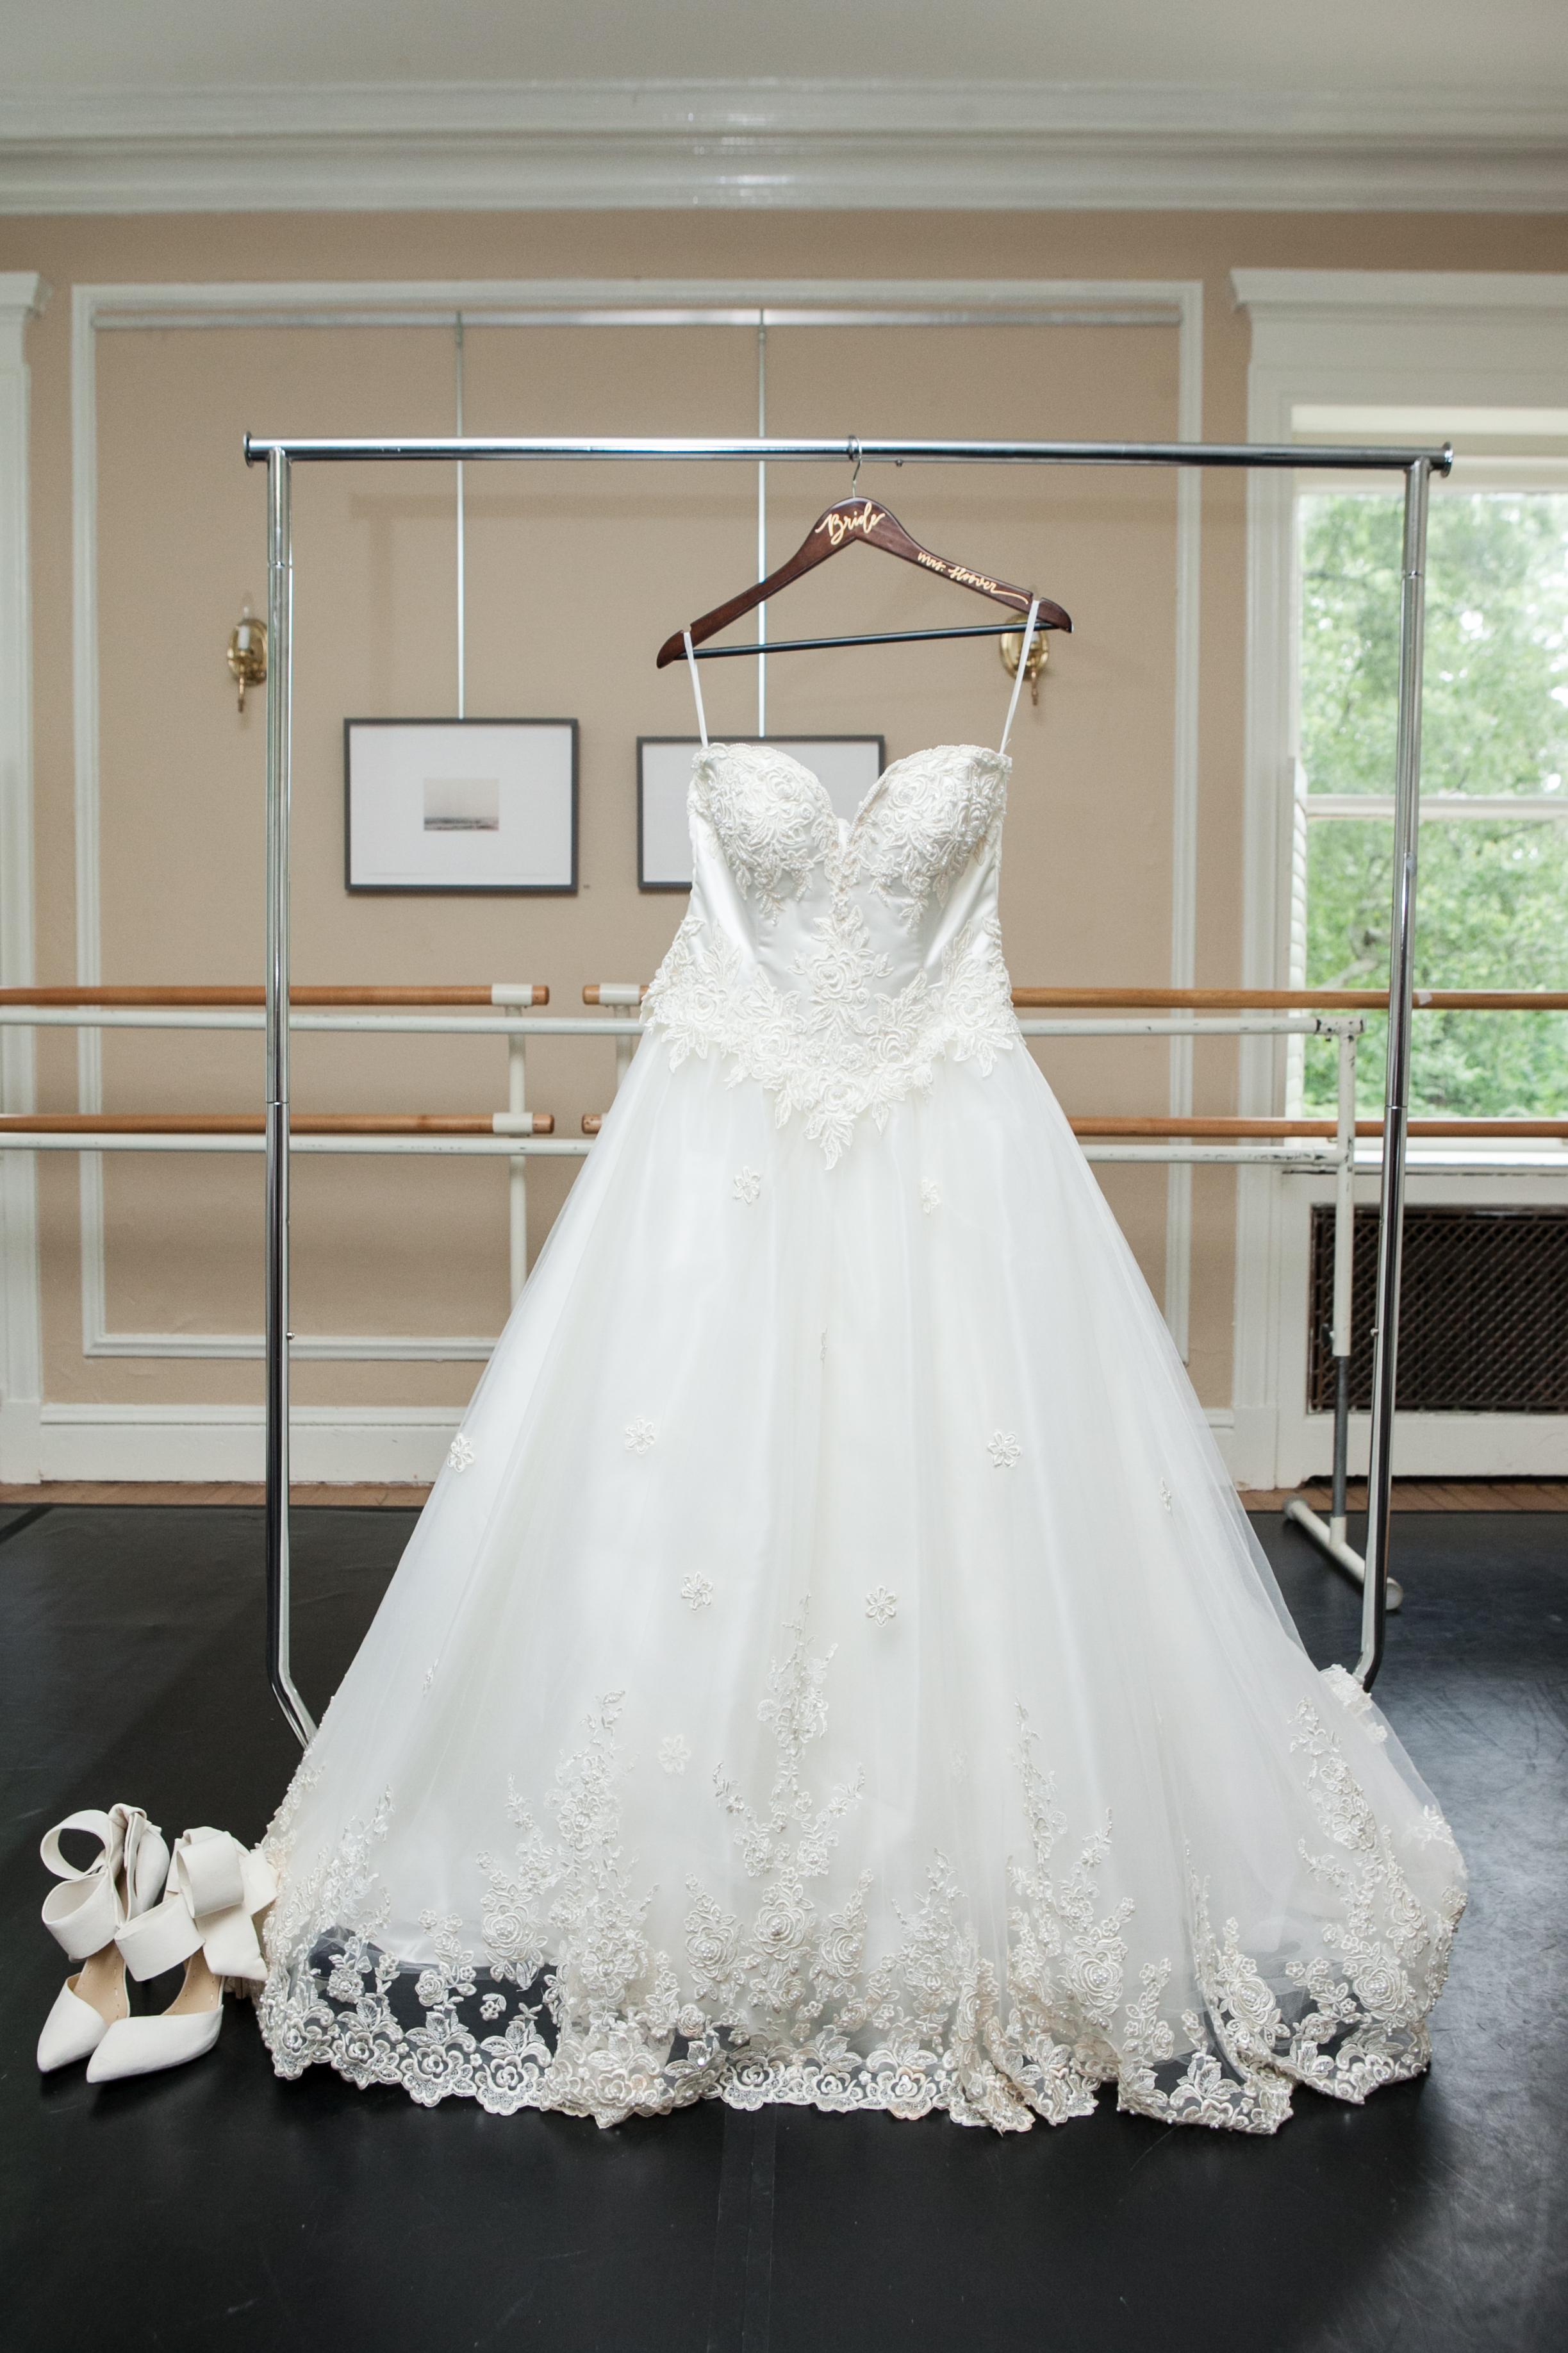 heylux_abbriakeith_wedding_3.jpg